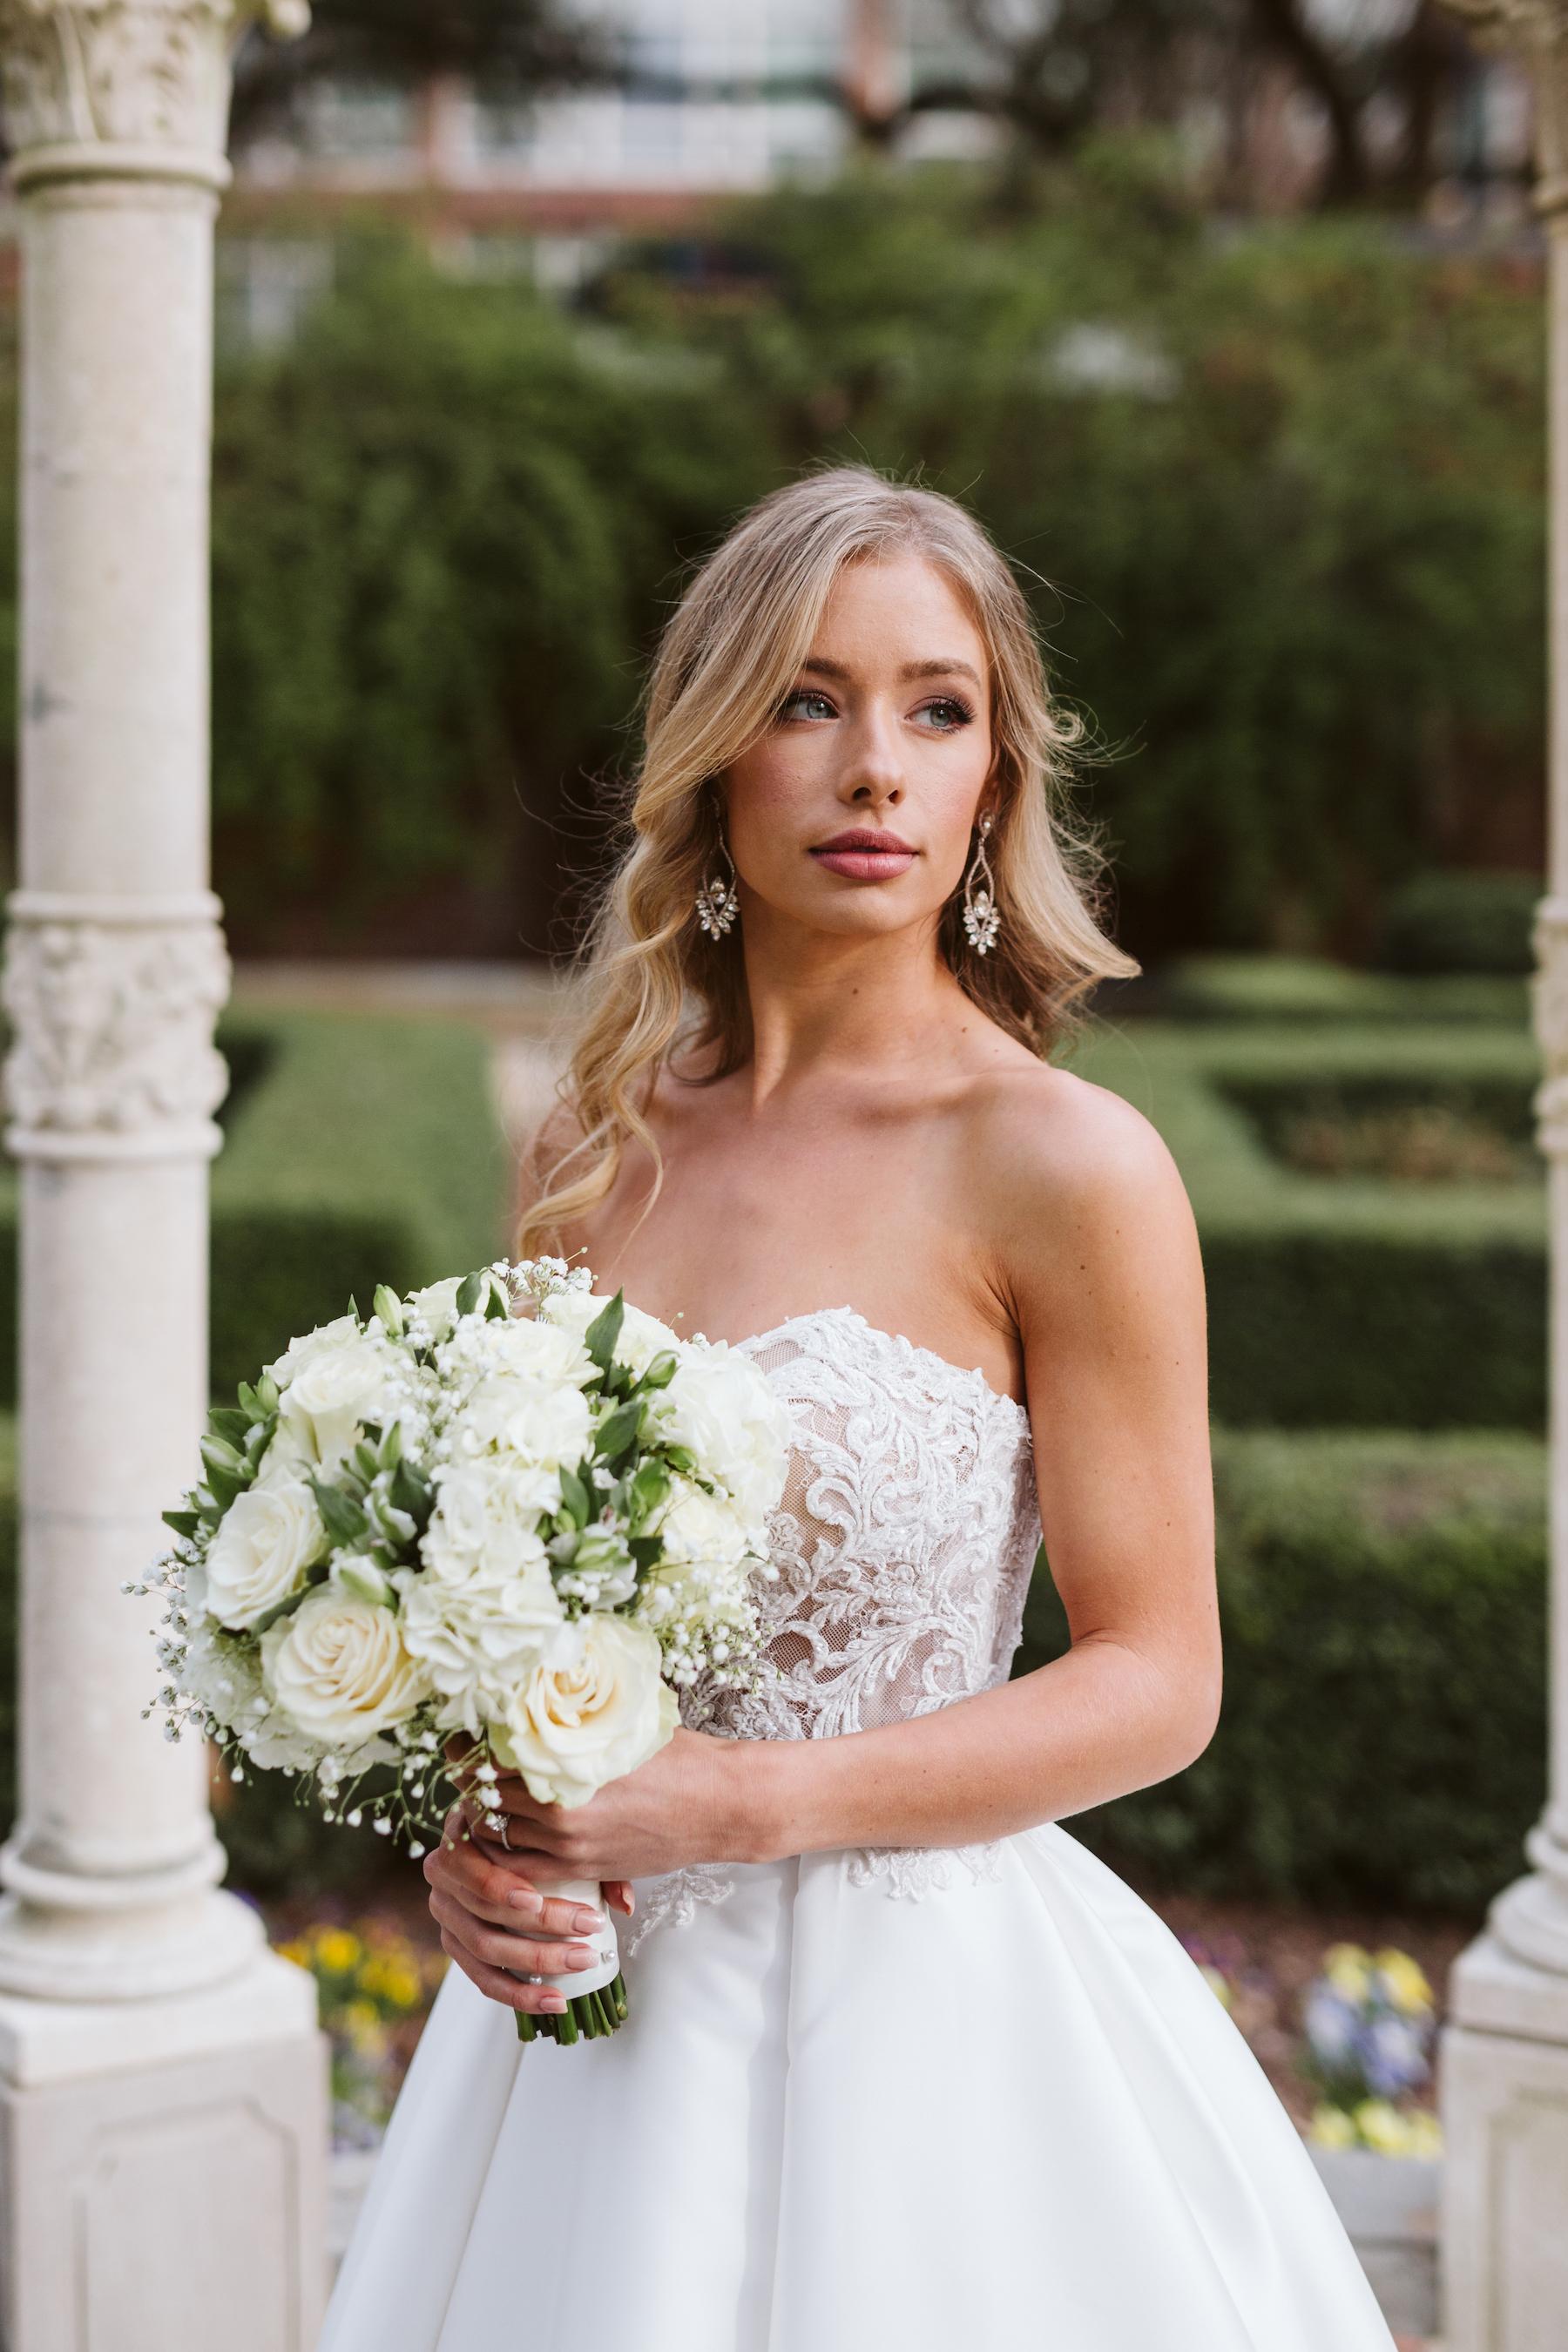 furman-university-bridals-paige-200.JPG